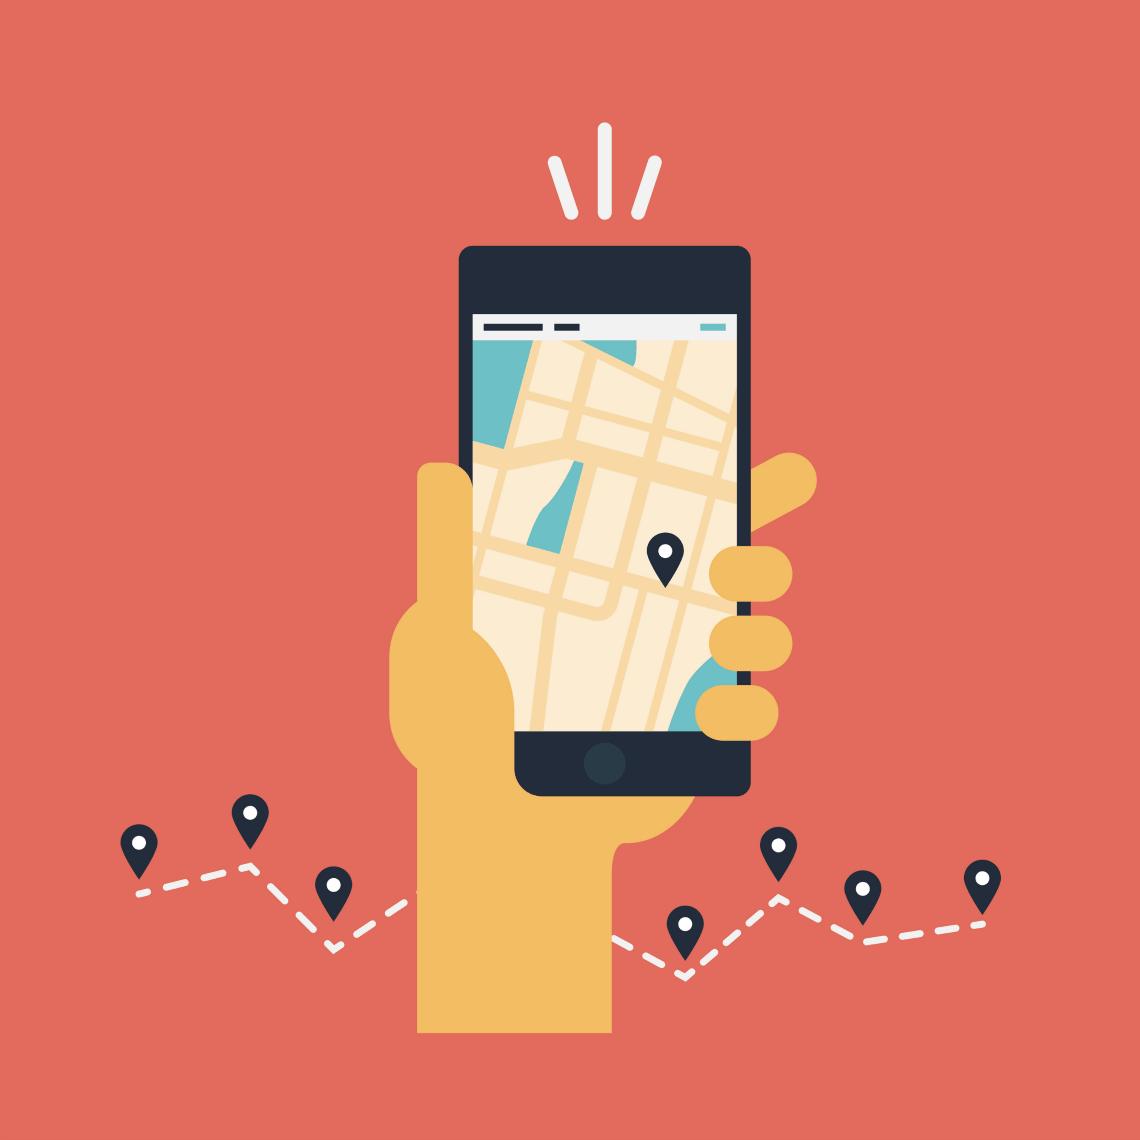 smartphone-google-maps-1140-1140x1140